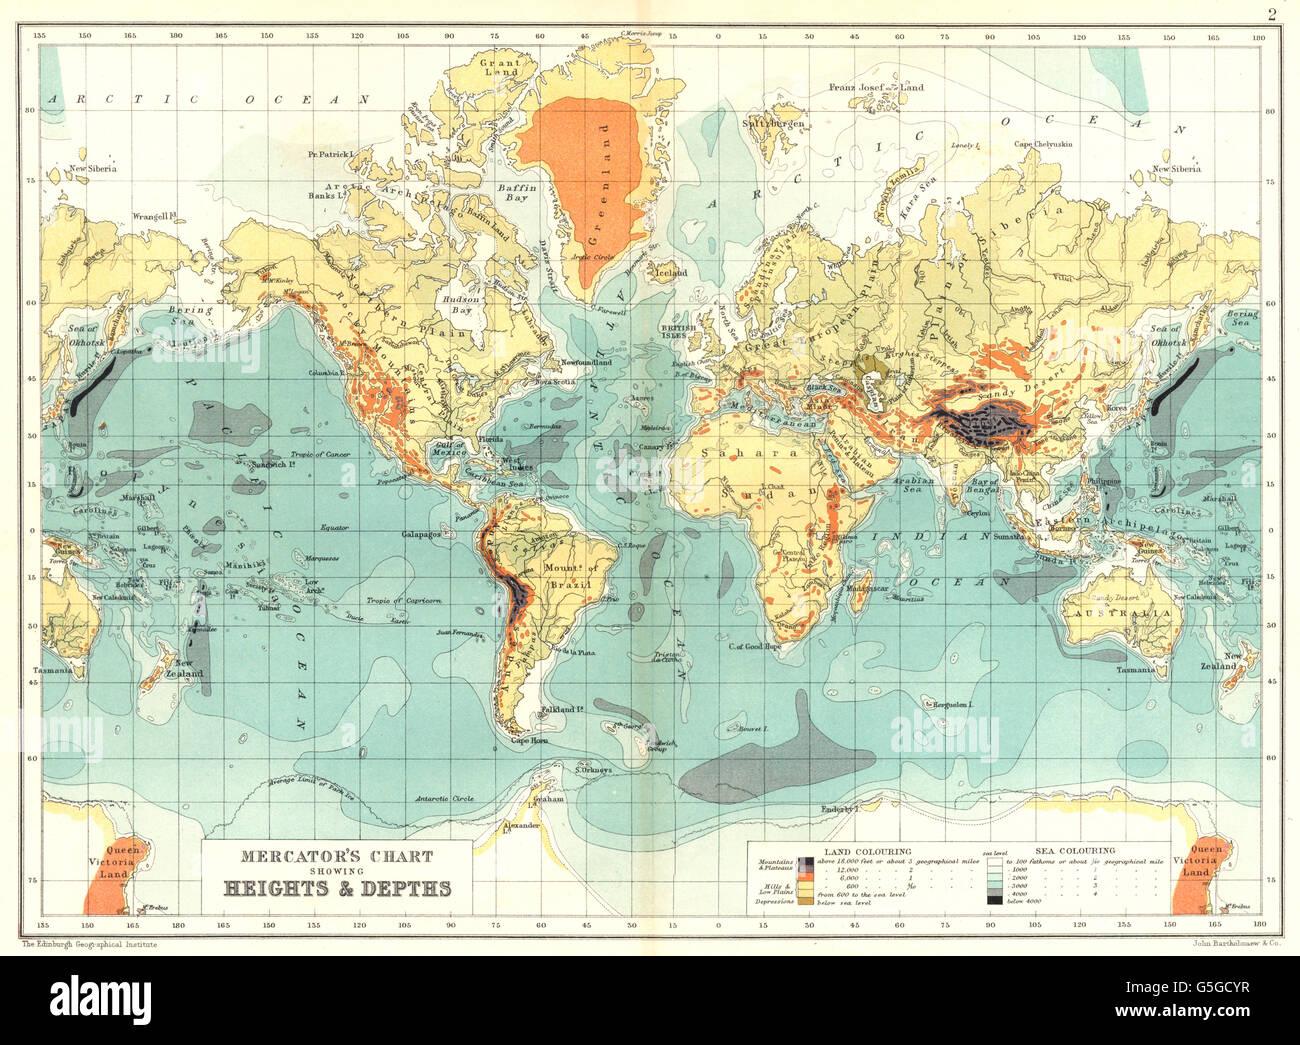 WORLD Mercators Chart Showing Heights Depths Antique Map - Map showing ocean depths